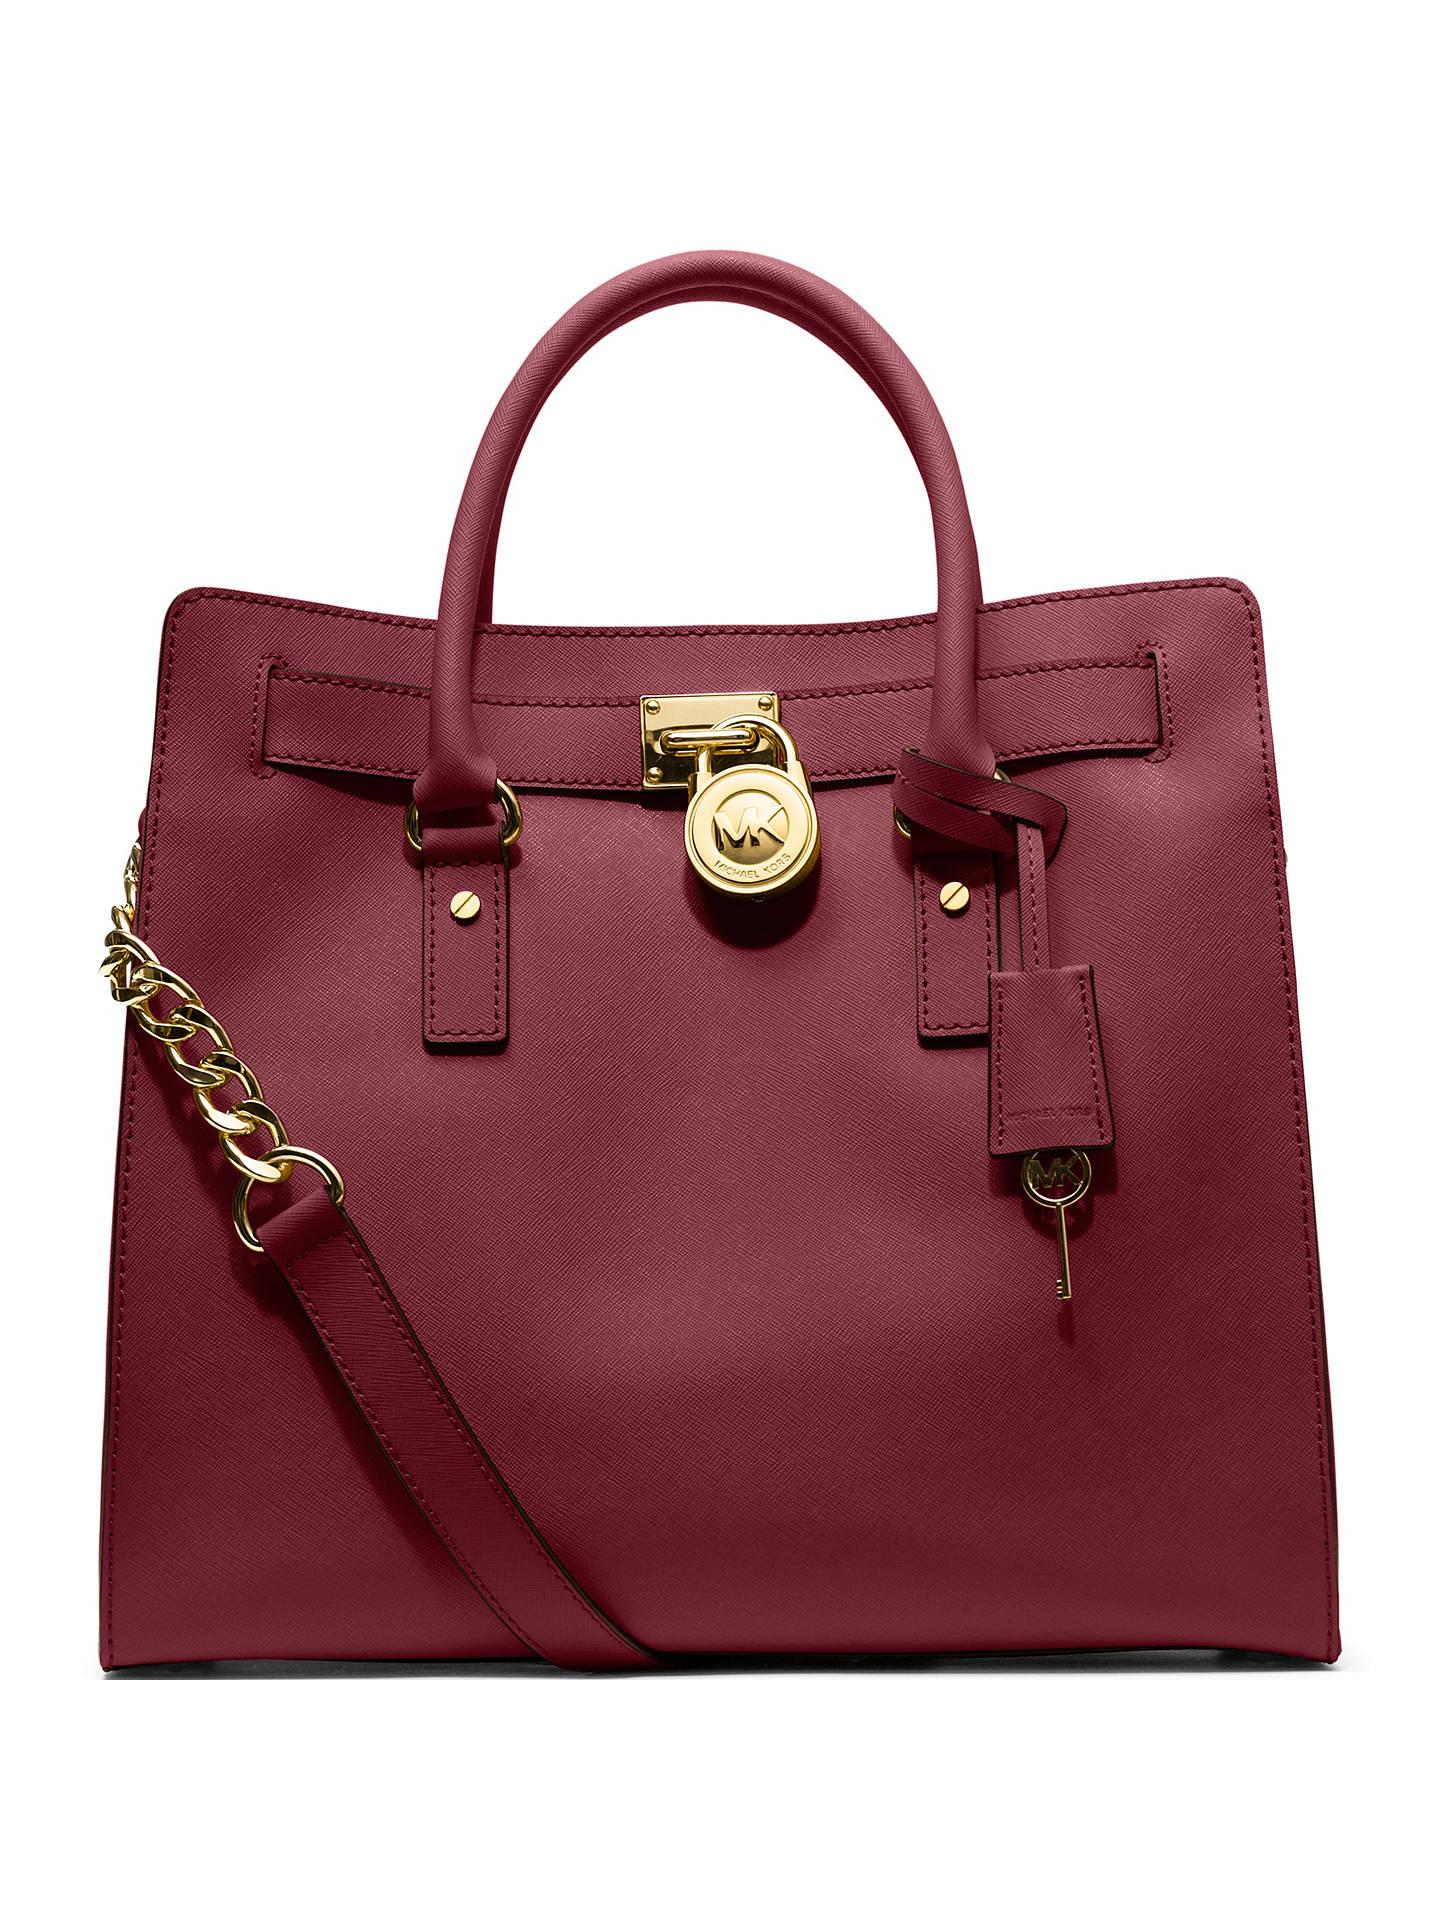 fe4a2b6a7 Buy MICHAEL Michael Kors Hamilton Large Saffiano Leather Tote Bag, Claret  Online at johnlewis.